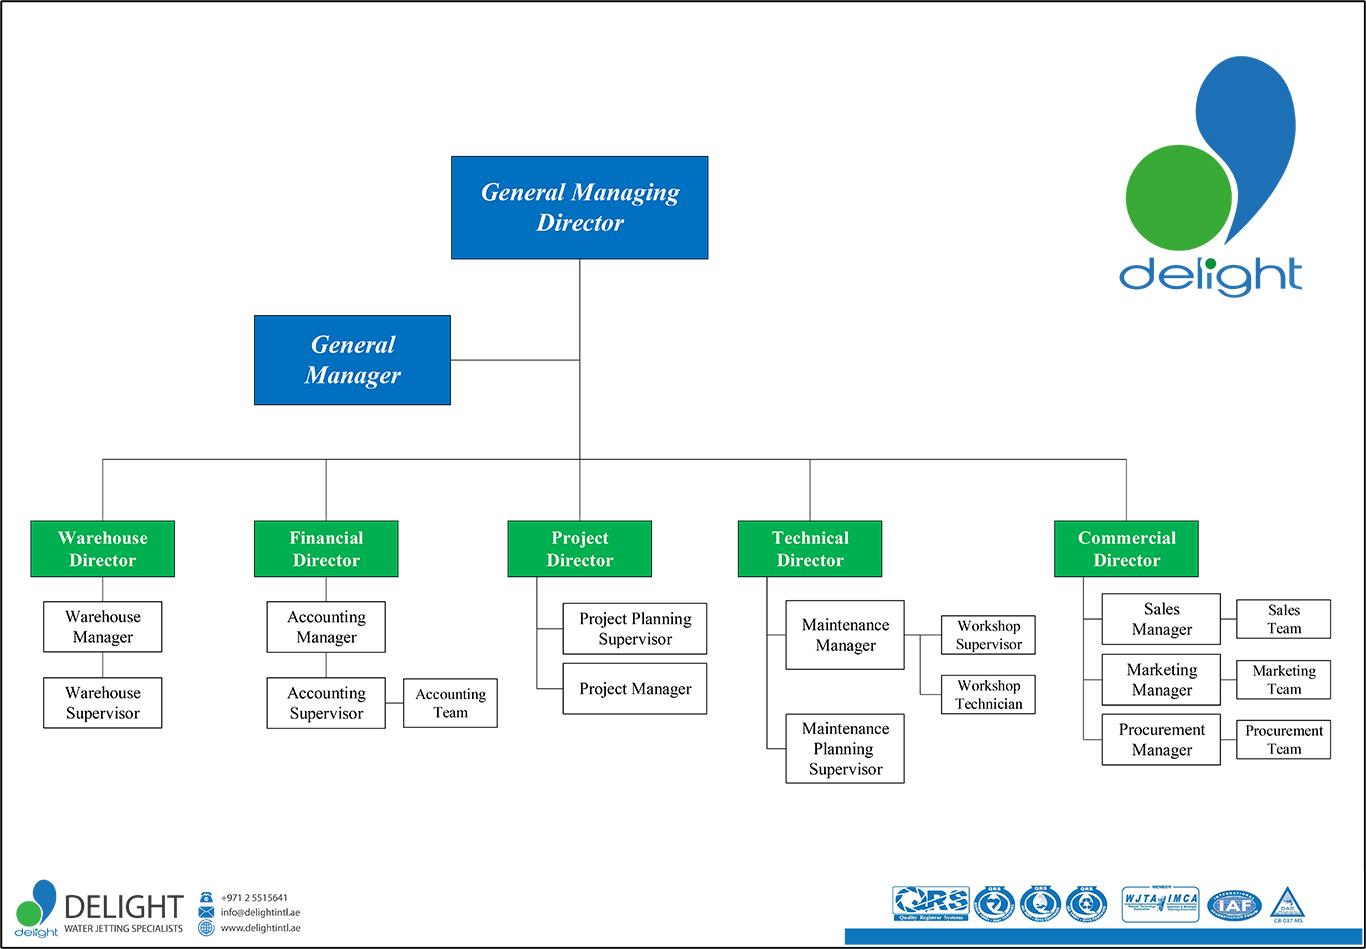 DELIGHT-ORGANIZATION-CHART